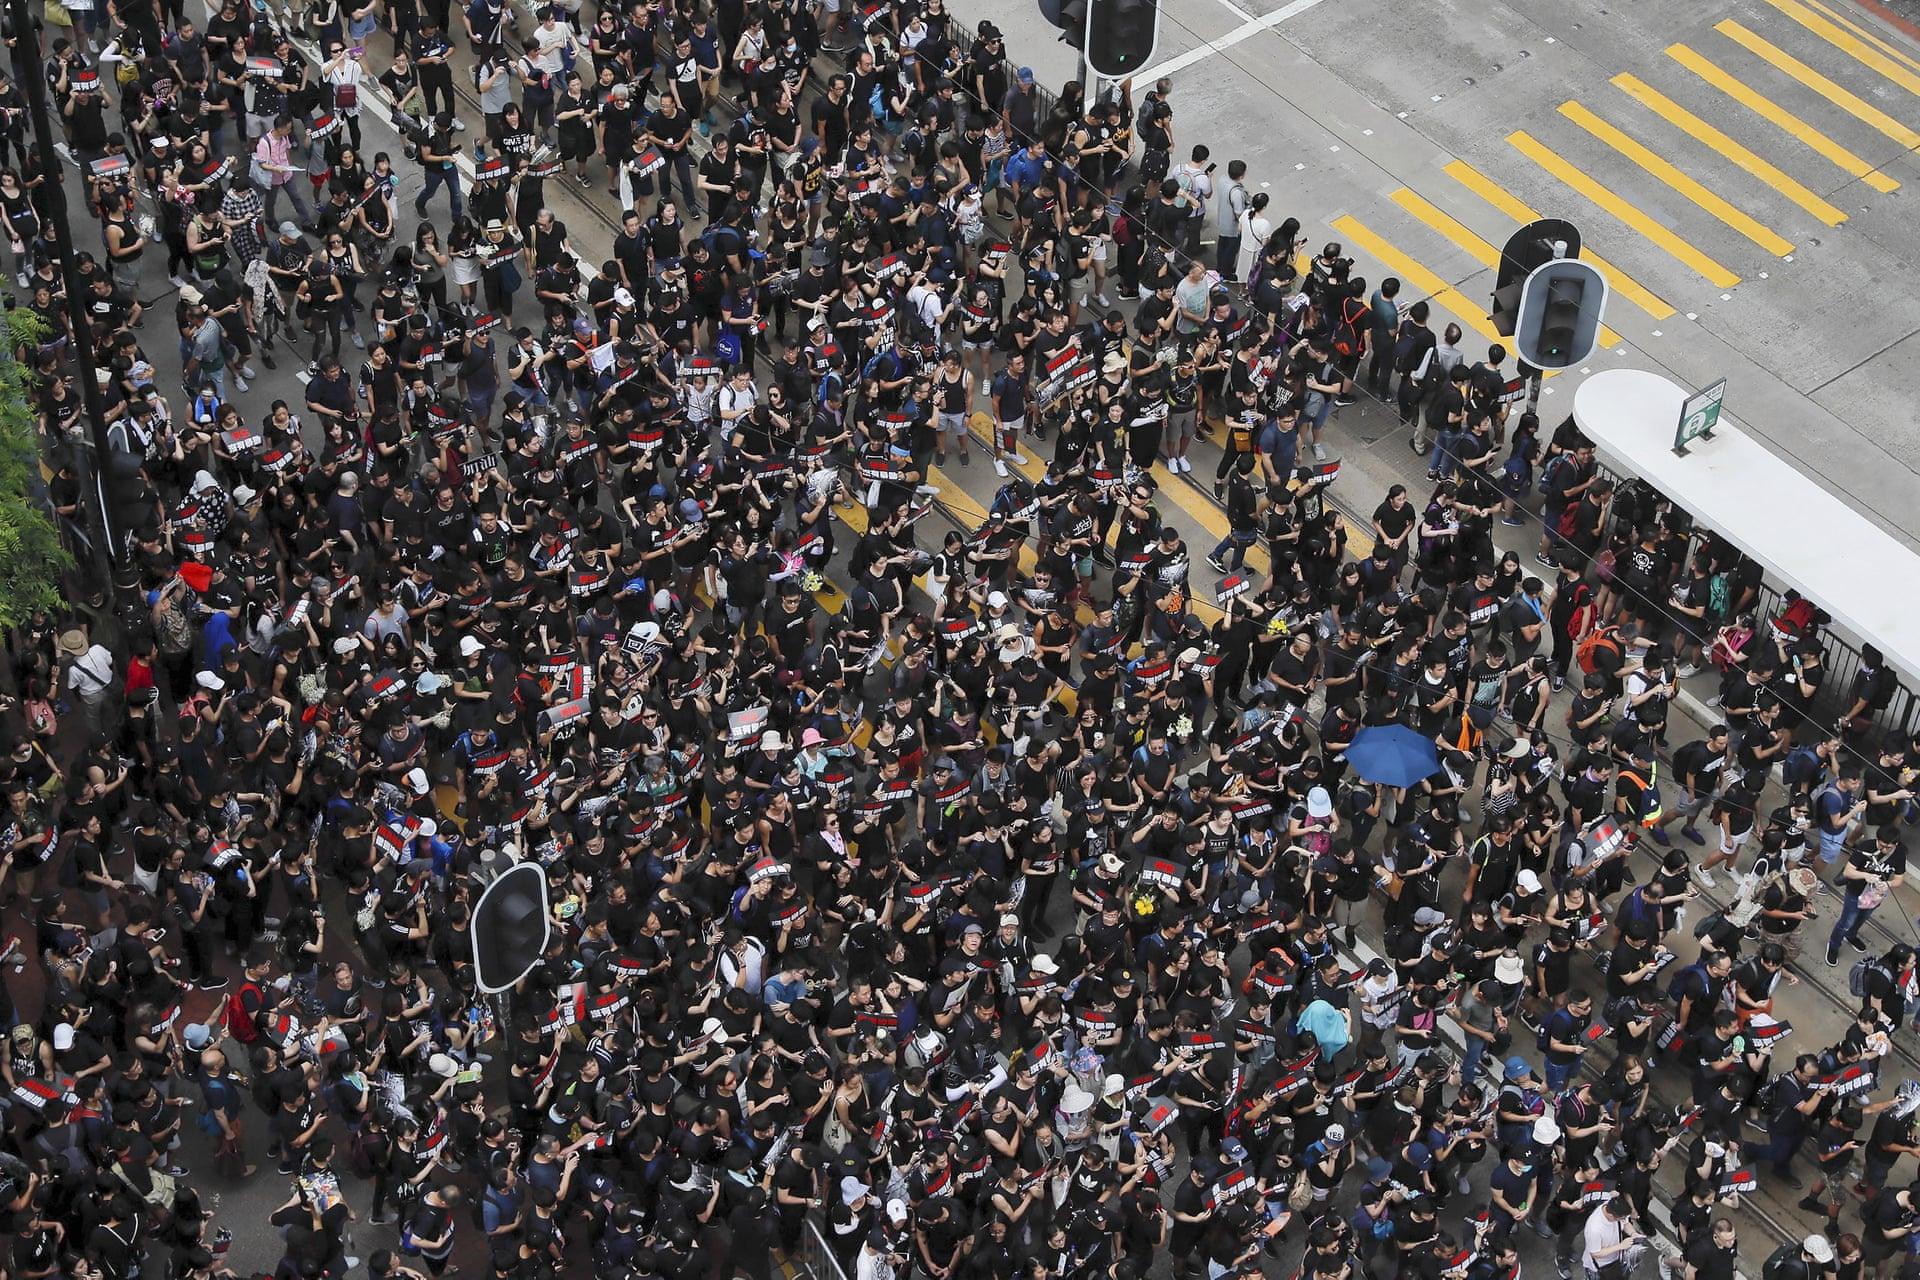 Kin Cheung/AP/SCANPIX